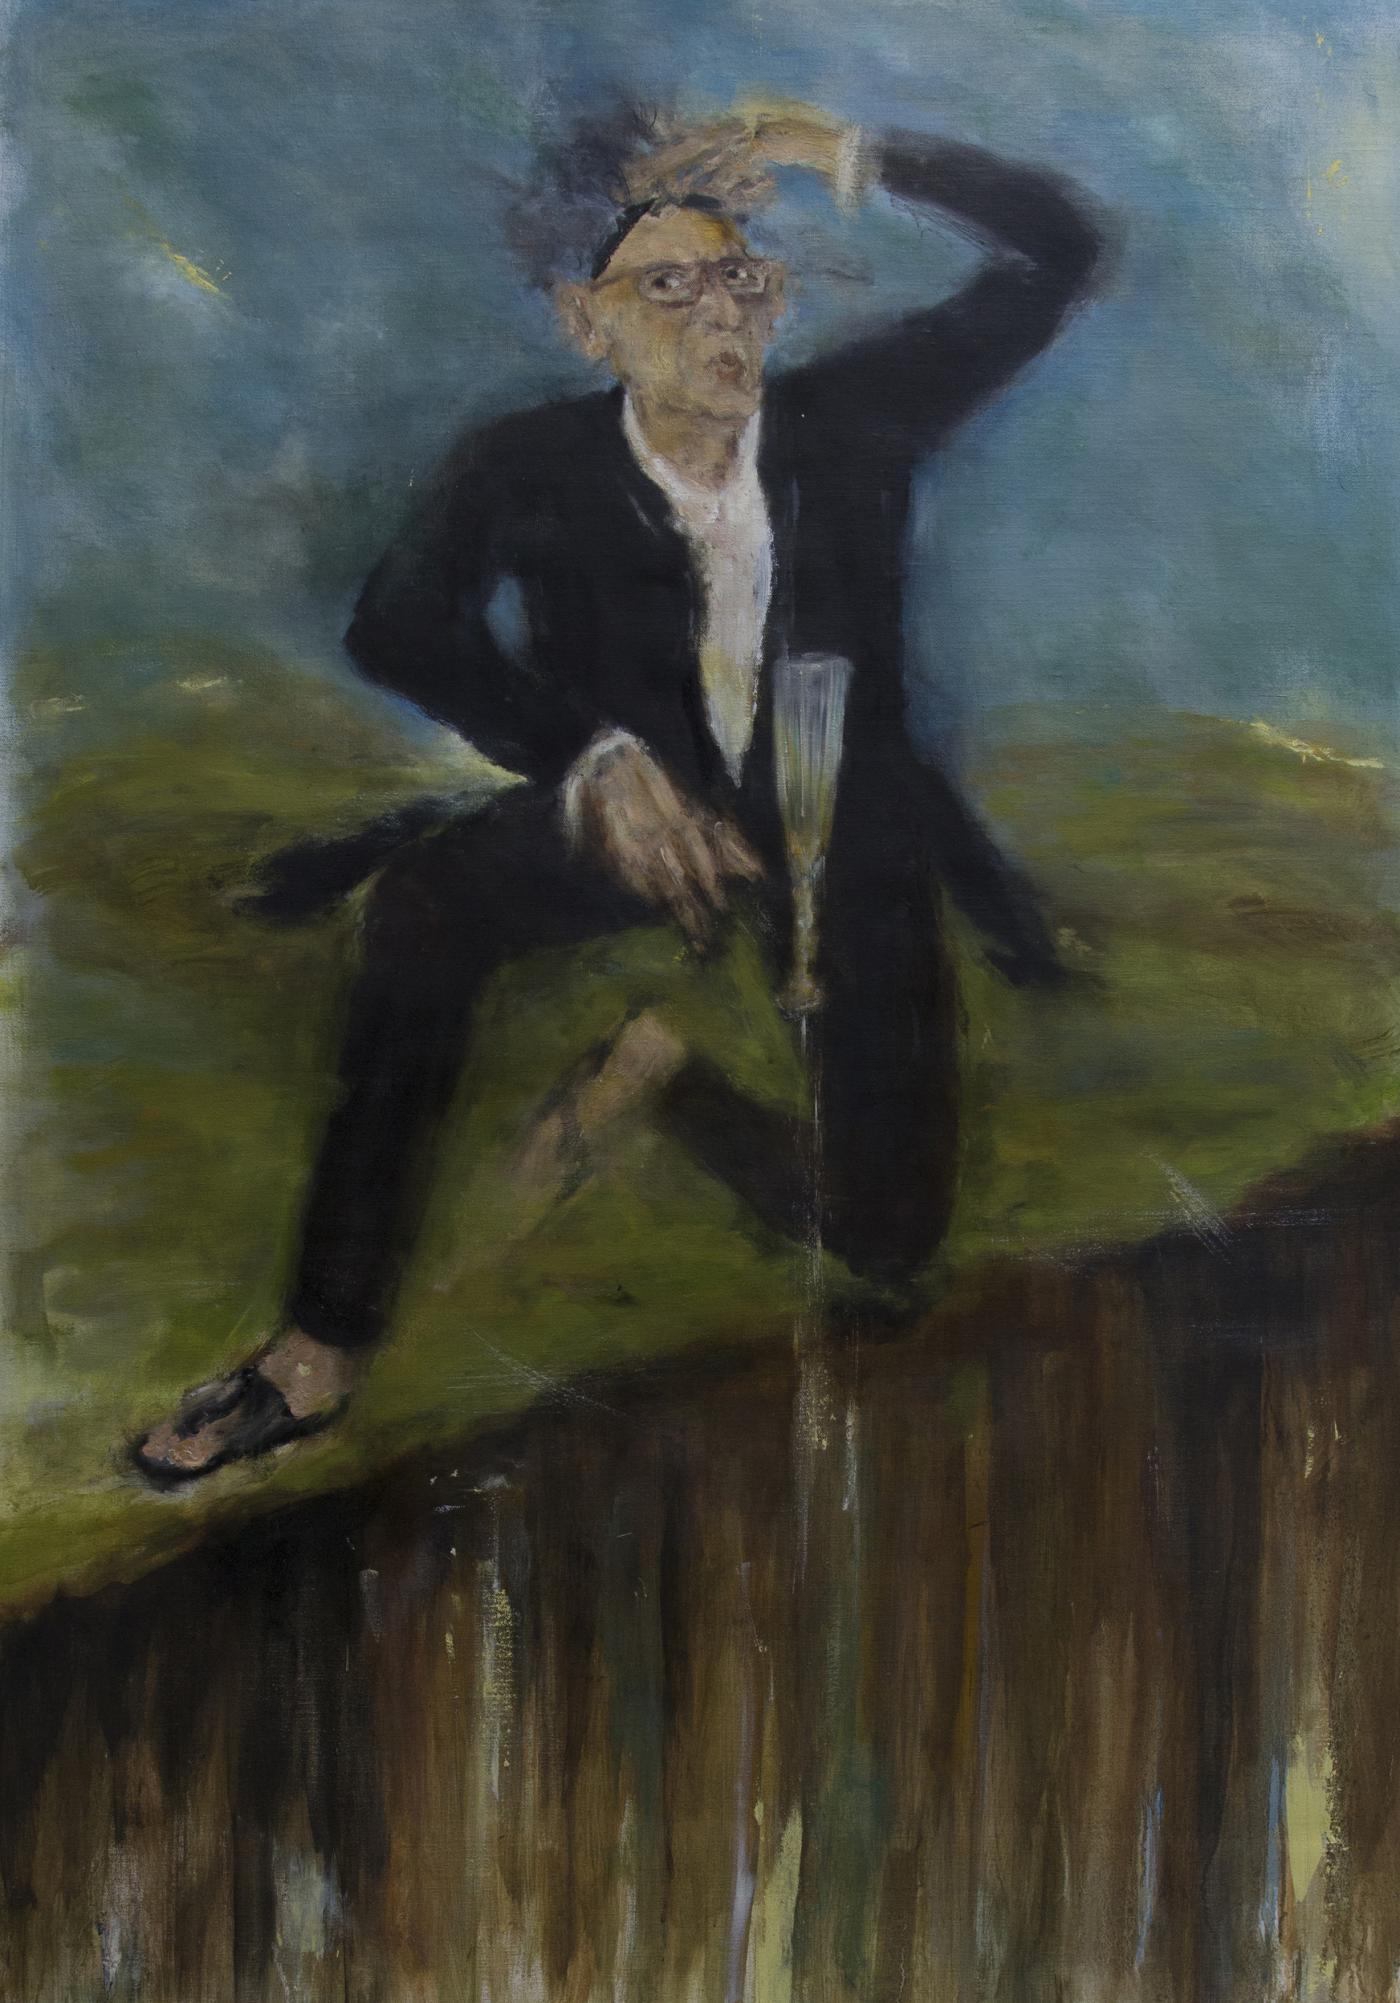 Graeme Drendel, Martin King, Lewis Miller, Paul S. Miller and Rodney Pople – 2021 Doug Moran National Portrait Prize Semi-Finalists